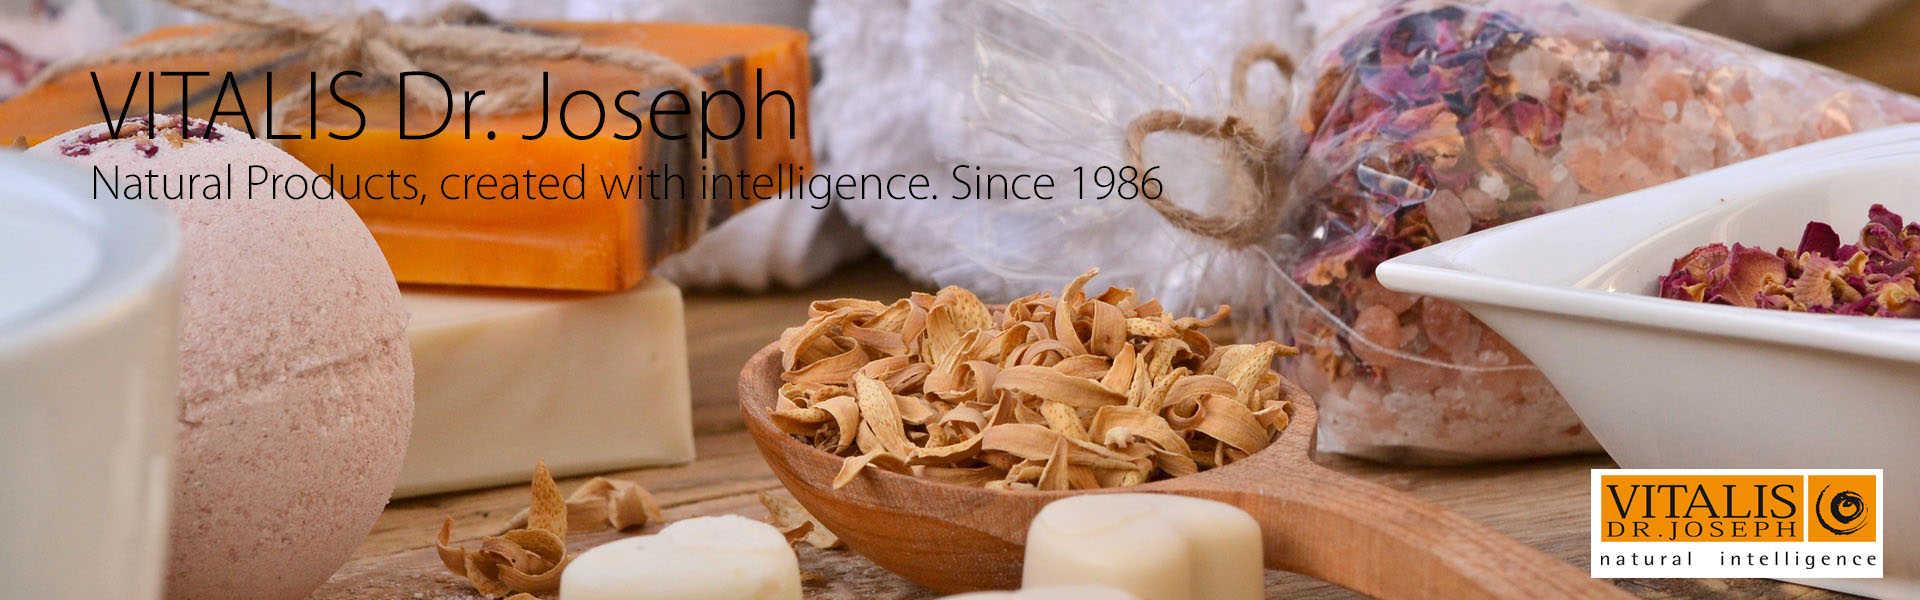 Wellness - Packung und Peeling - Headerbild